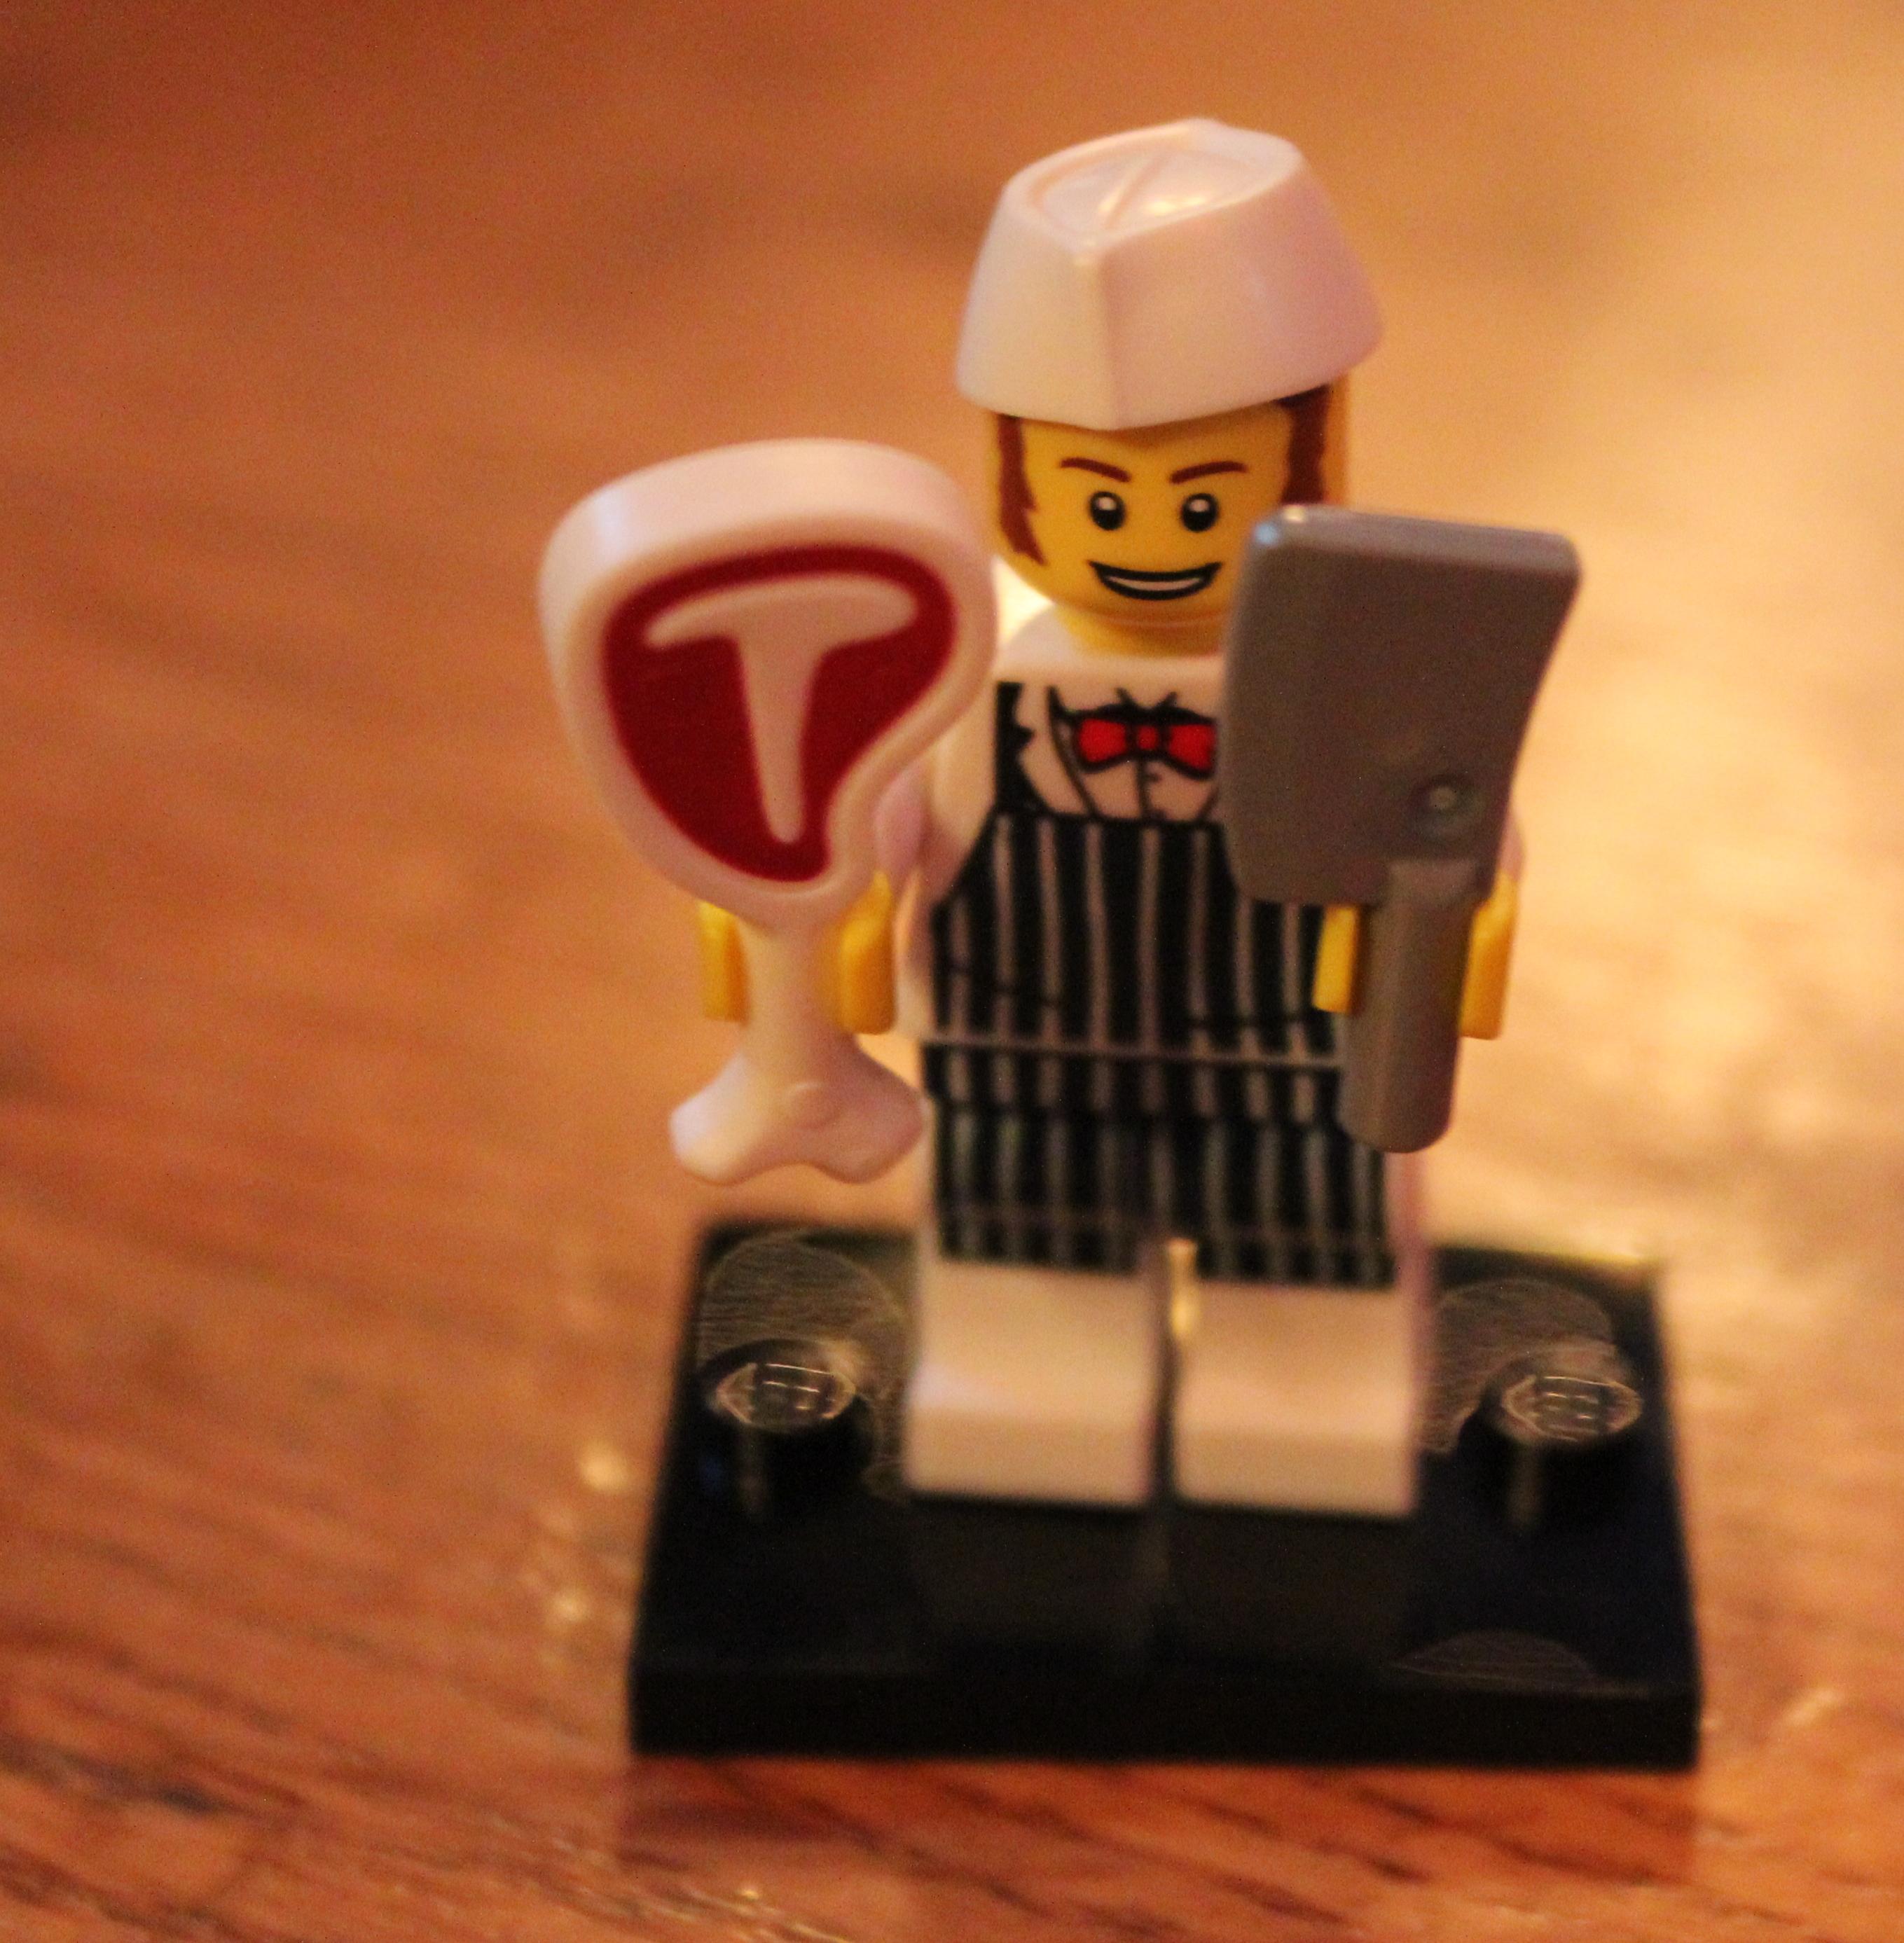 Lego Butcher